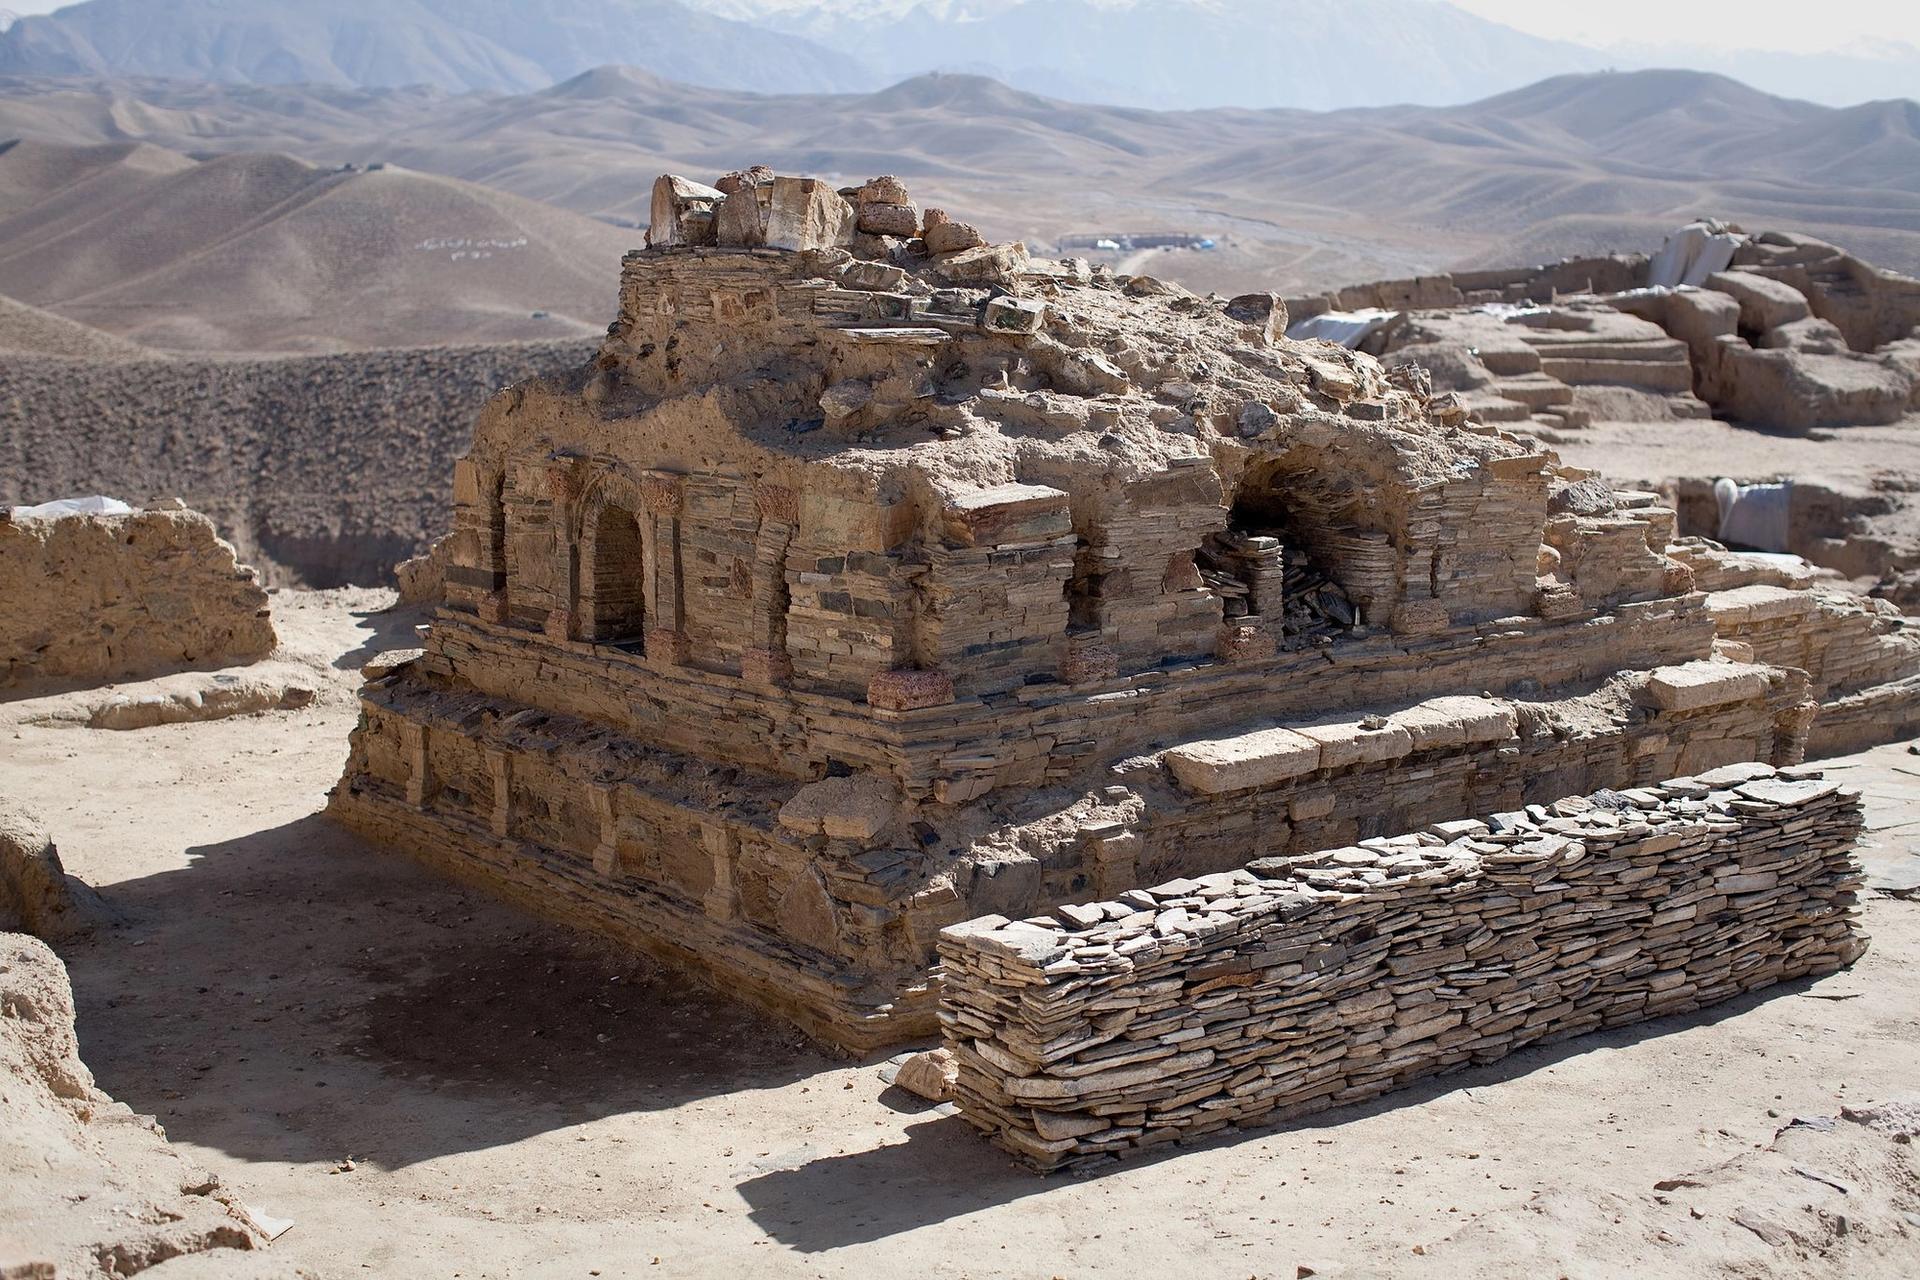 The Buddhist ruins sit atop 450 million metric tonnes of copper ore Photo: Jerome Starkey